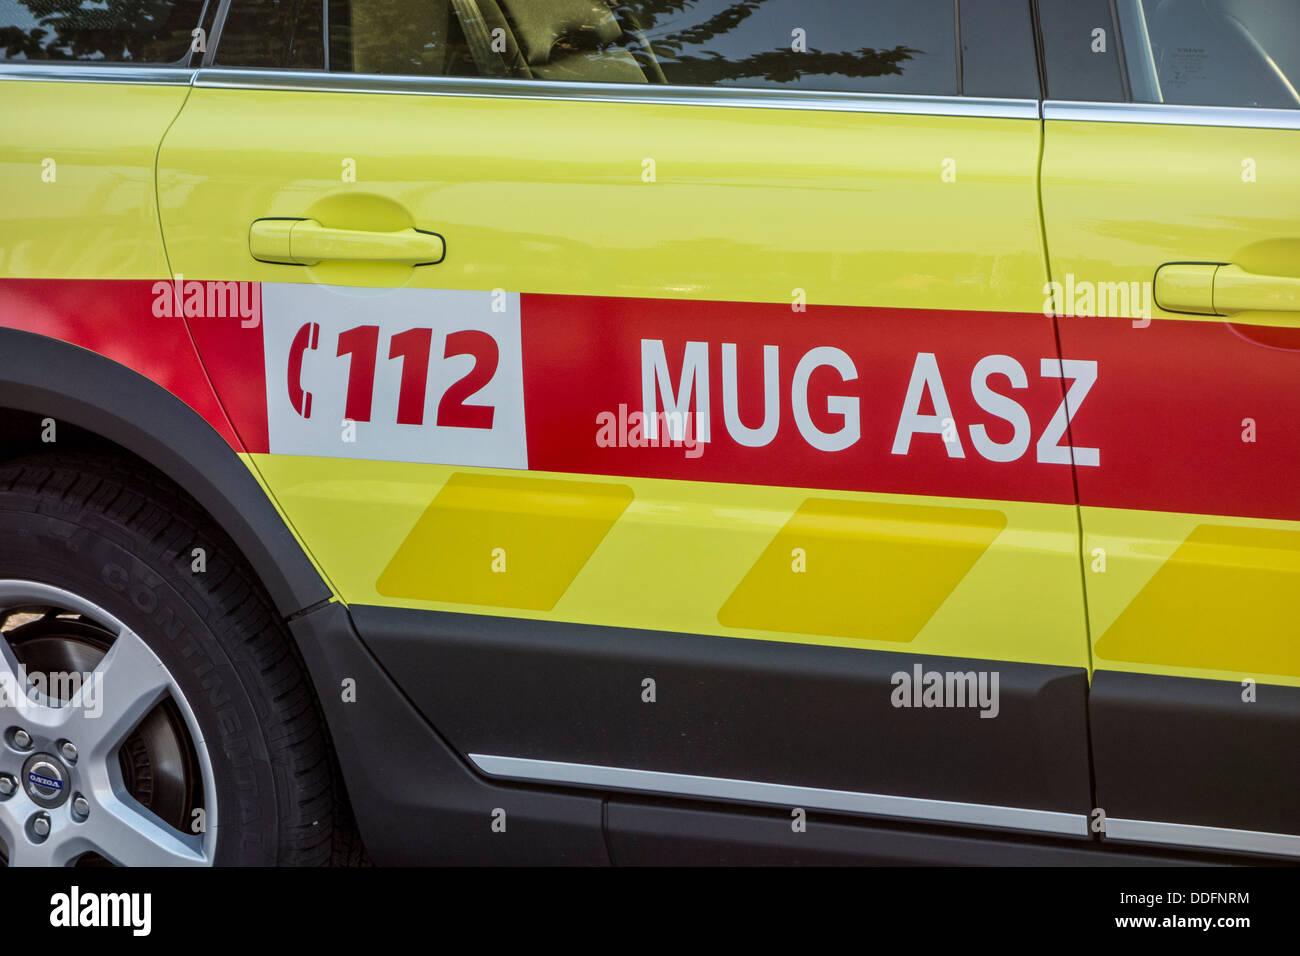 Car of the Belgian Mobile Intensive Care Unit / MICU / MUG or Mobile Urgency Group, Belgium - Stock Image